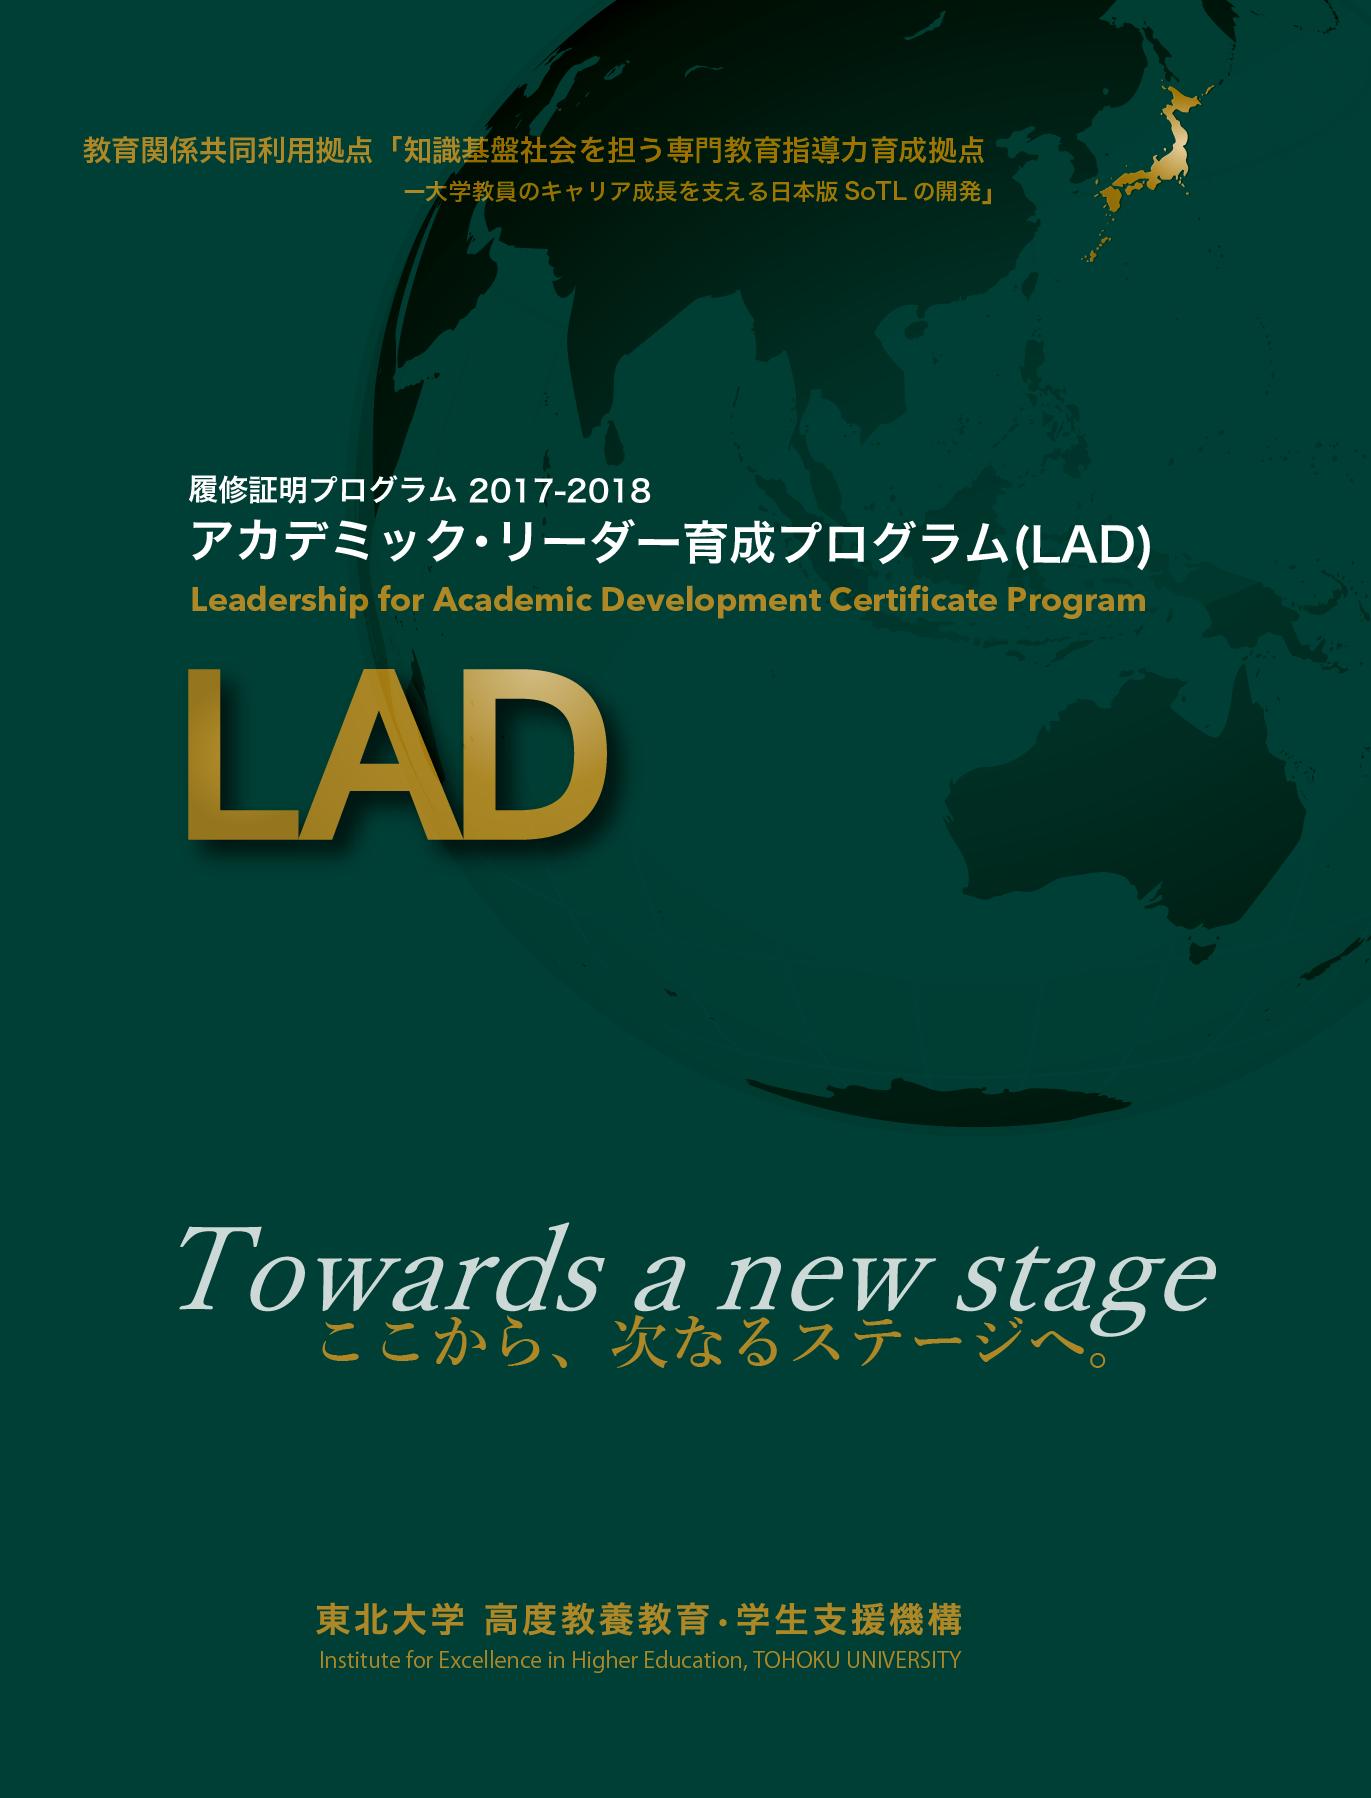 2017-2018年度LAD要項